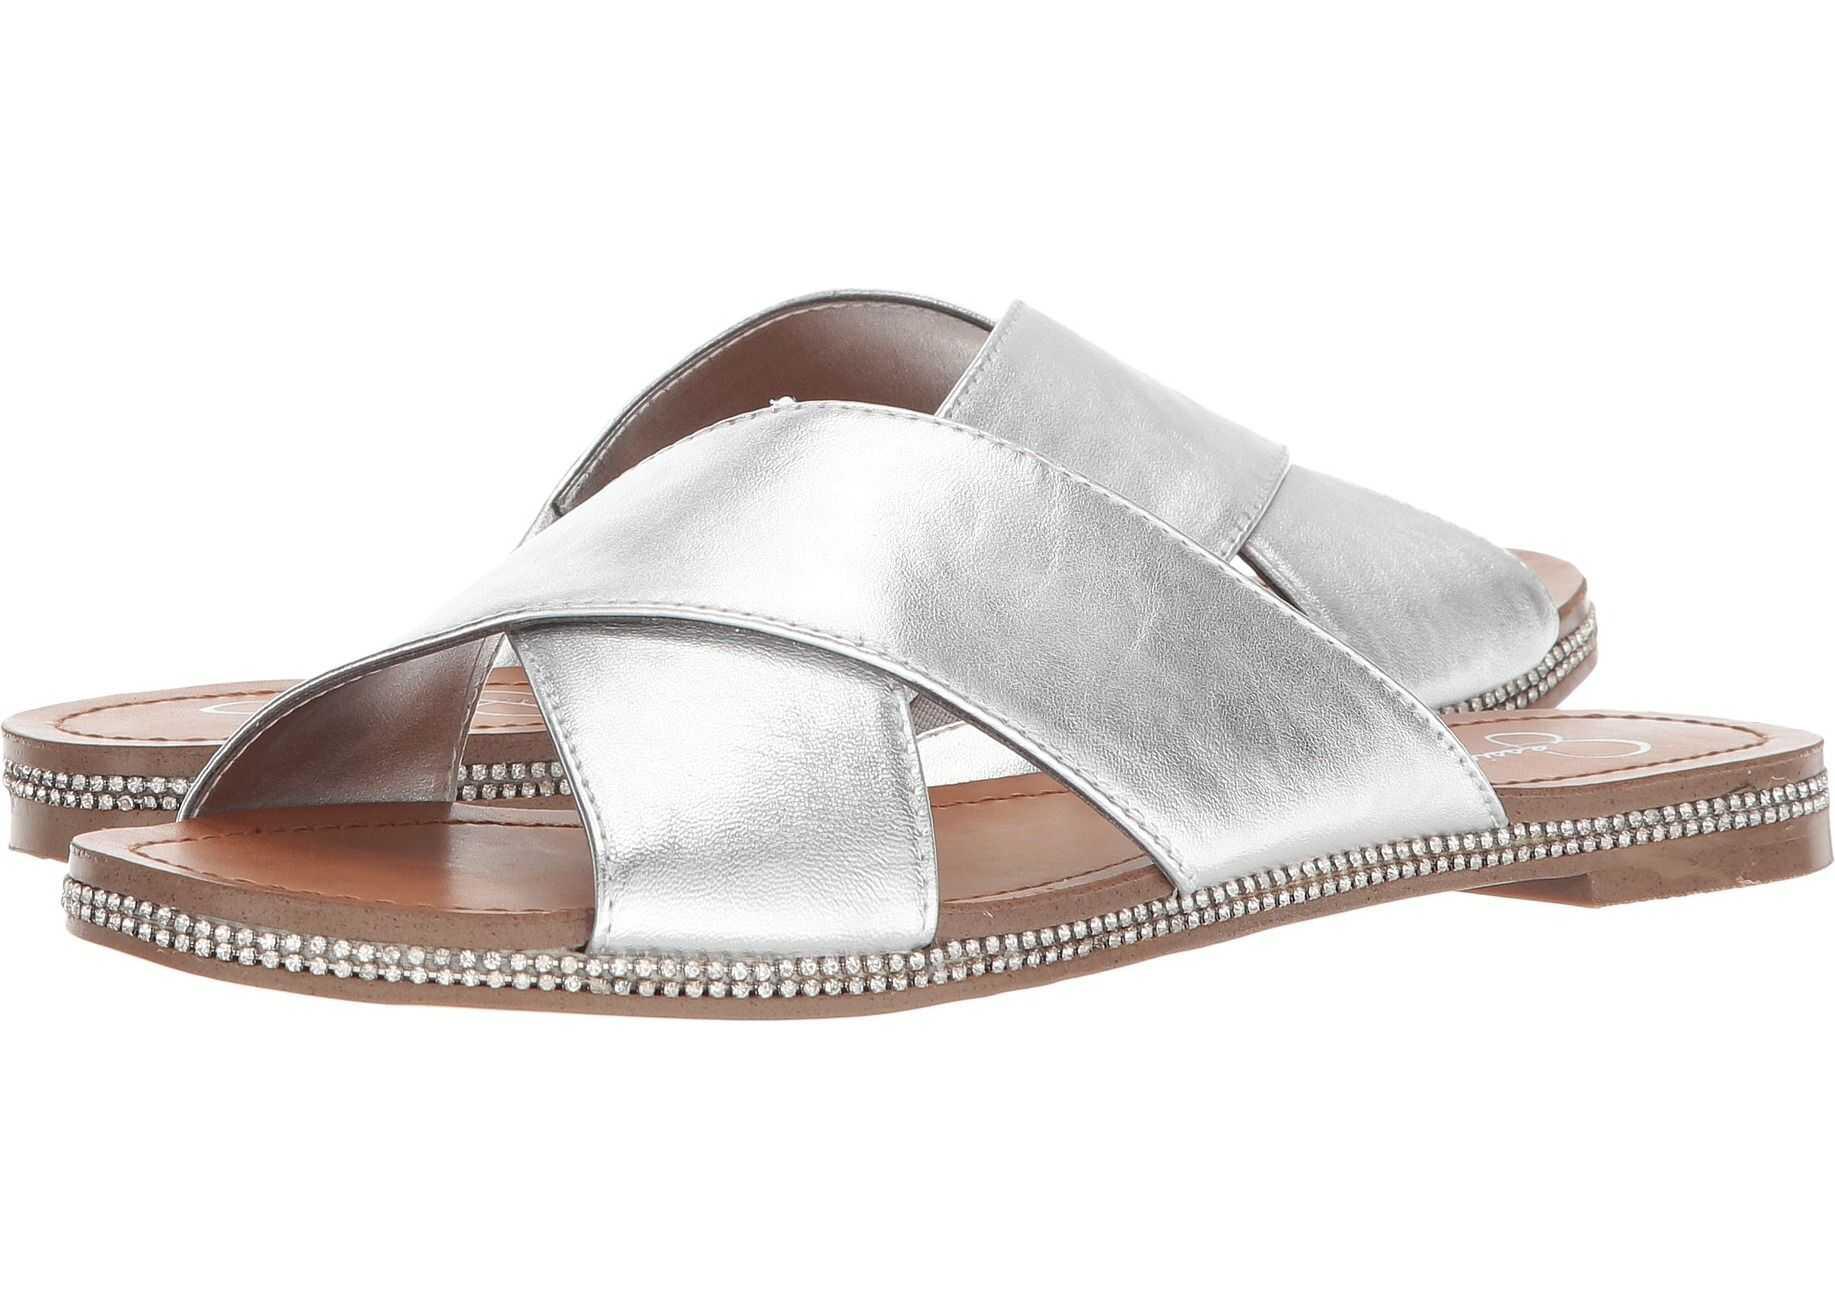 Jessica Simpson Brinella Platinum Metallic Italia Nappa